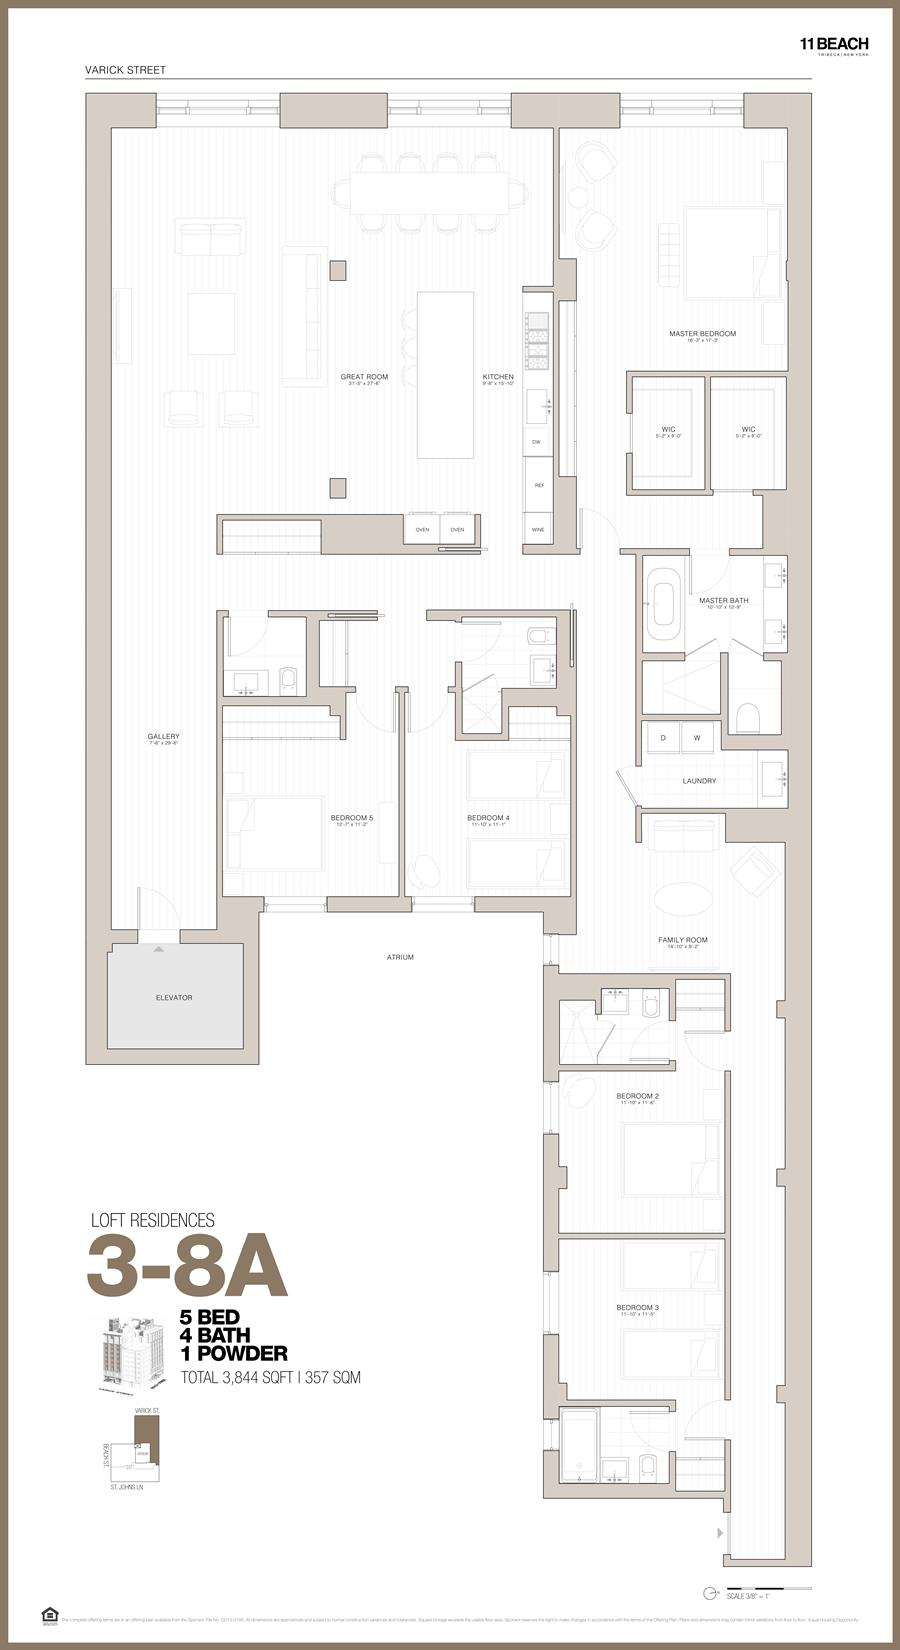 Floor plan of 11 Beach St, 6A - TriBeCa, New York